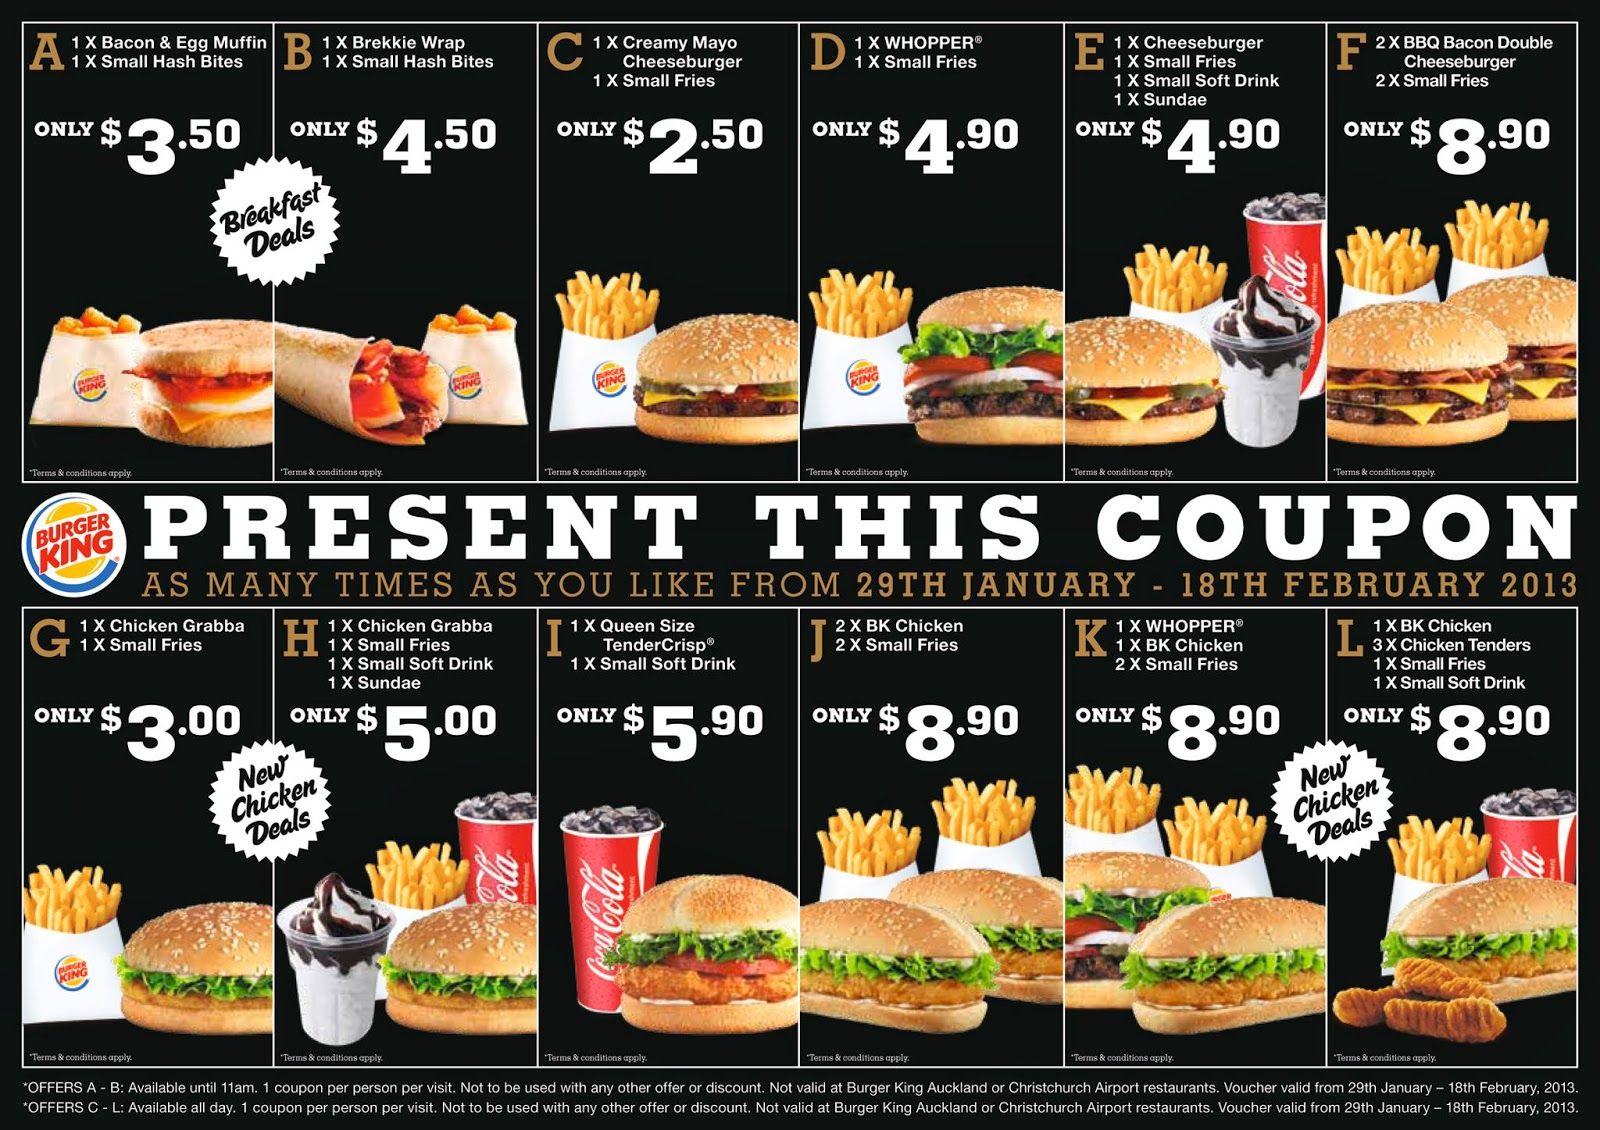 Printable Coupons: Burger King Coupons… | Burger King | Pinterest - Burger King Free Coupons Printable